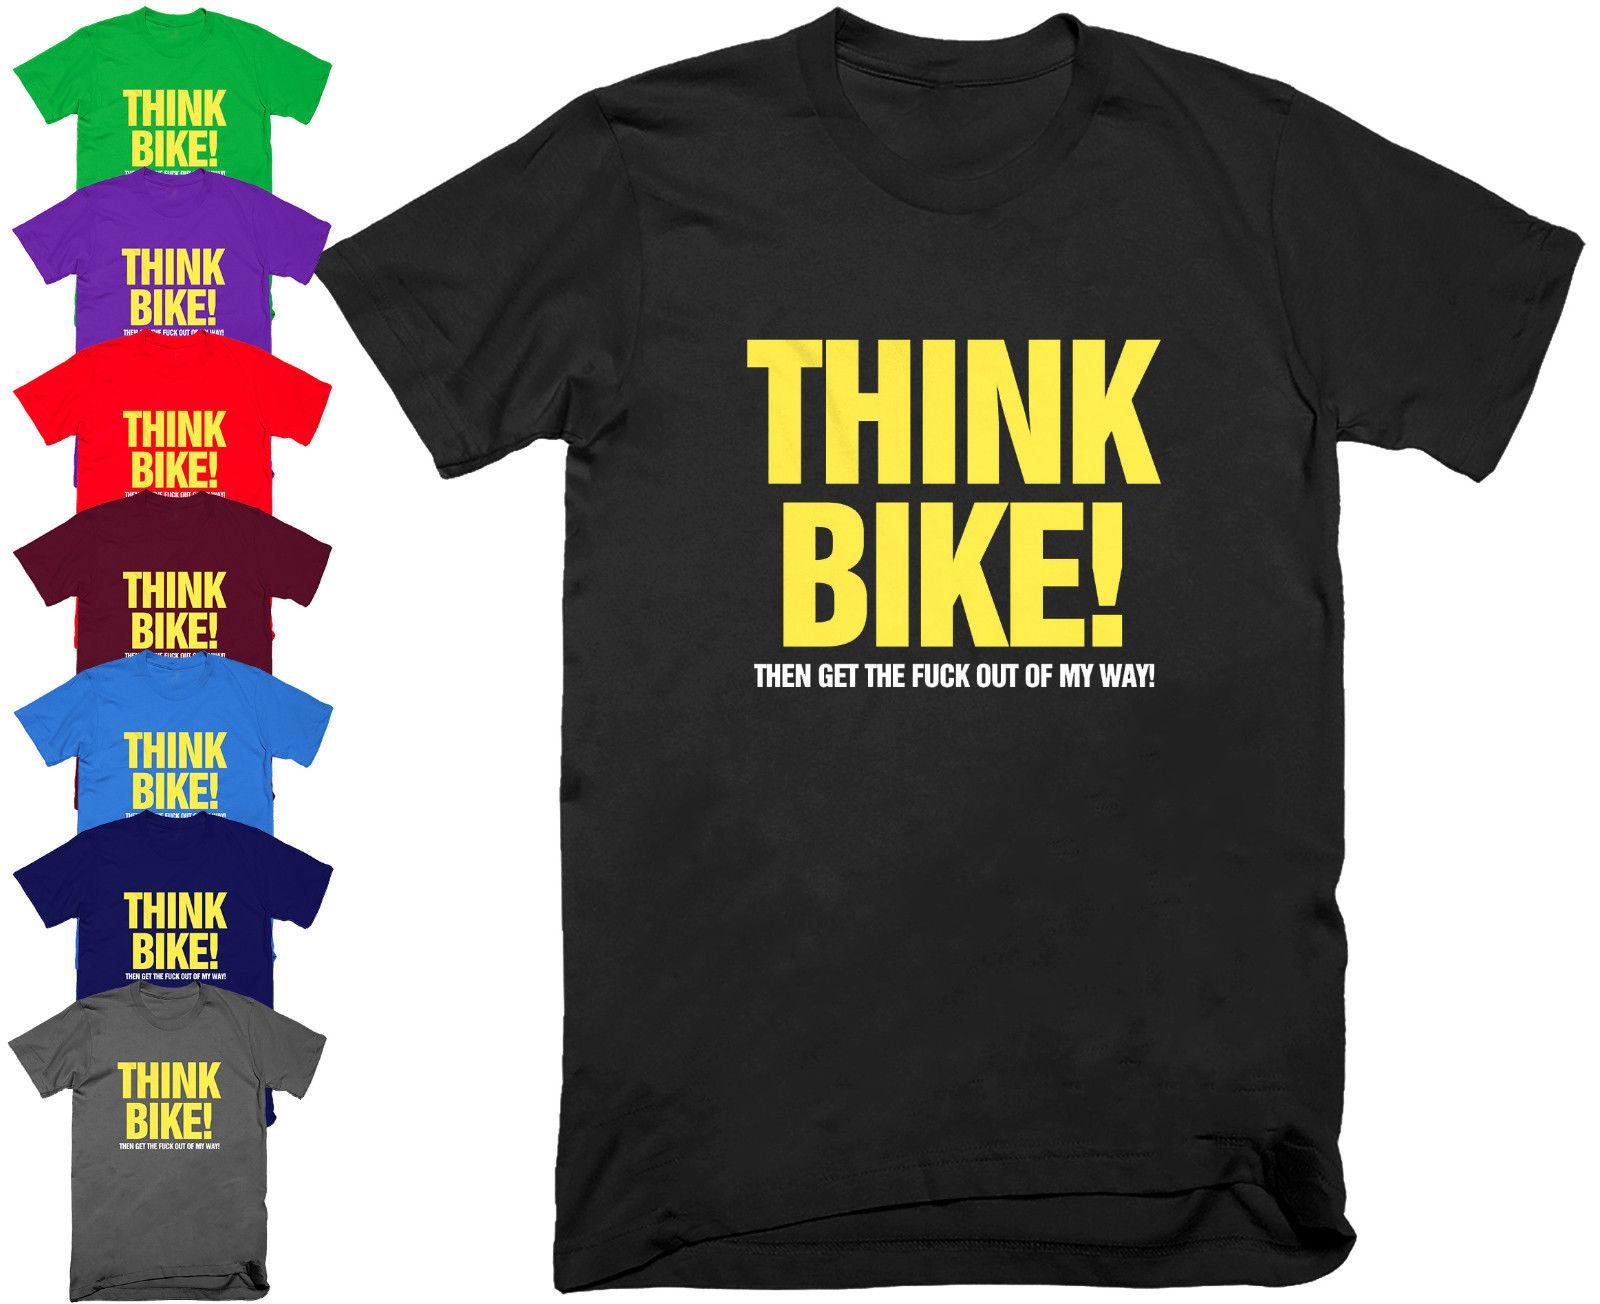 Think Bike Motorcycle Biker T Shirt Funny Birthday Present Gift Dad Top S 5XL Personality Cotton Printed Tea Shirts Fun Tshirts From Coachteeshirt